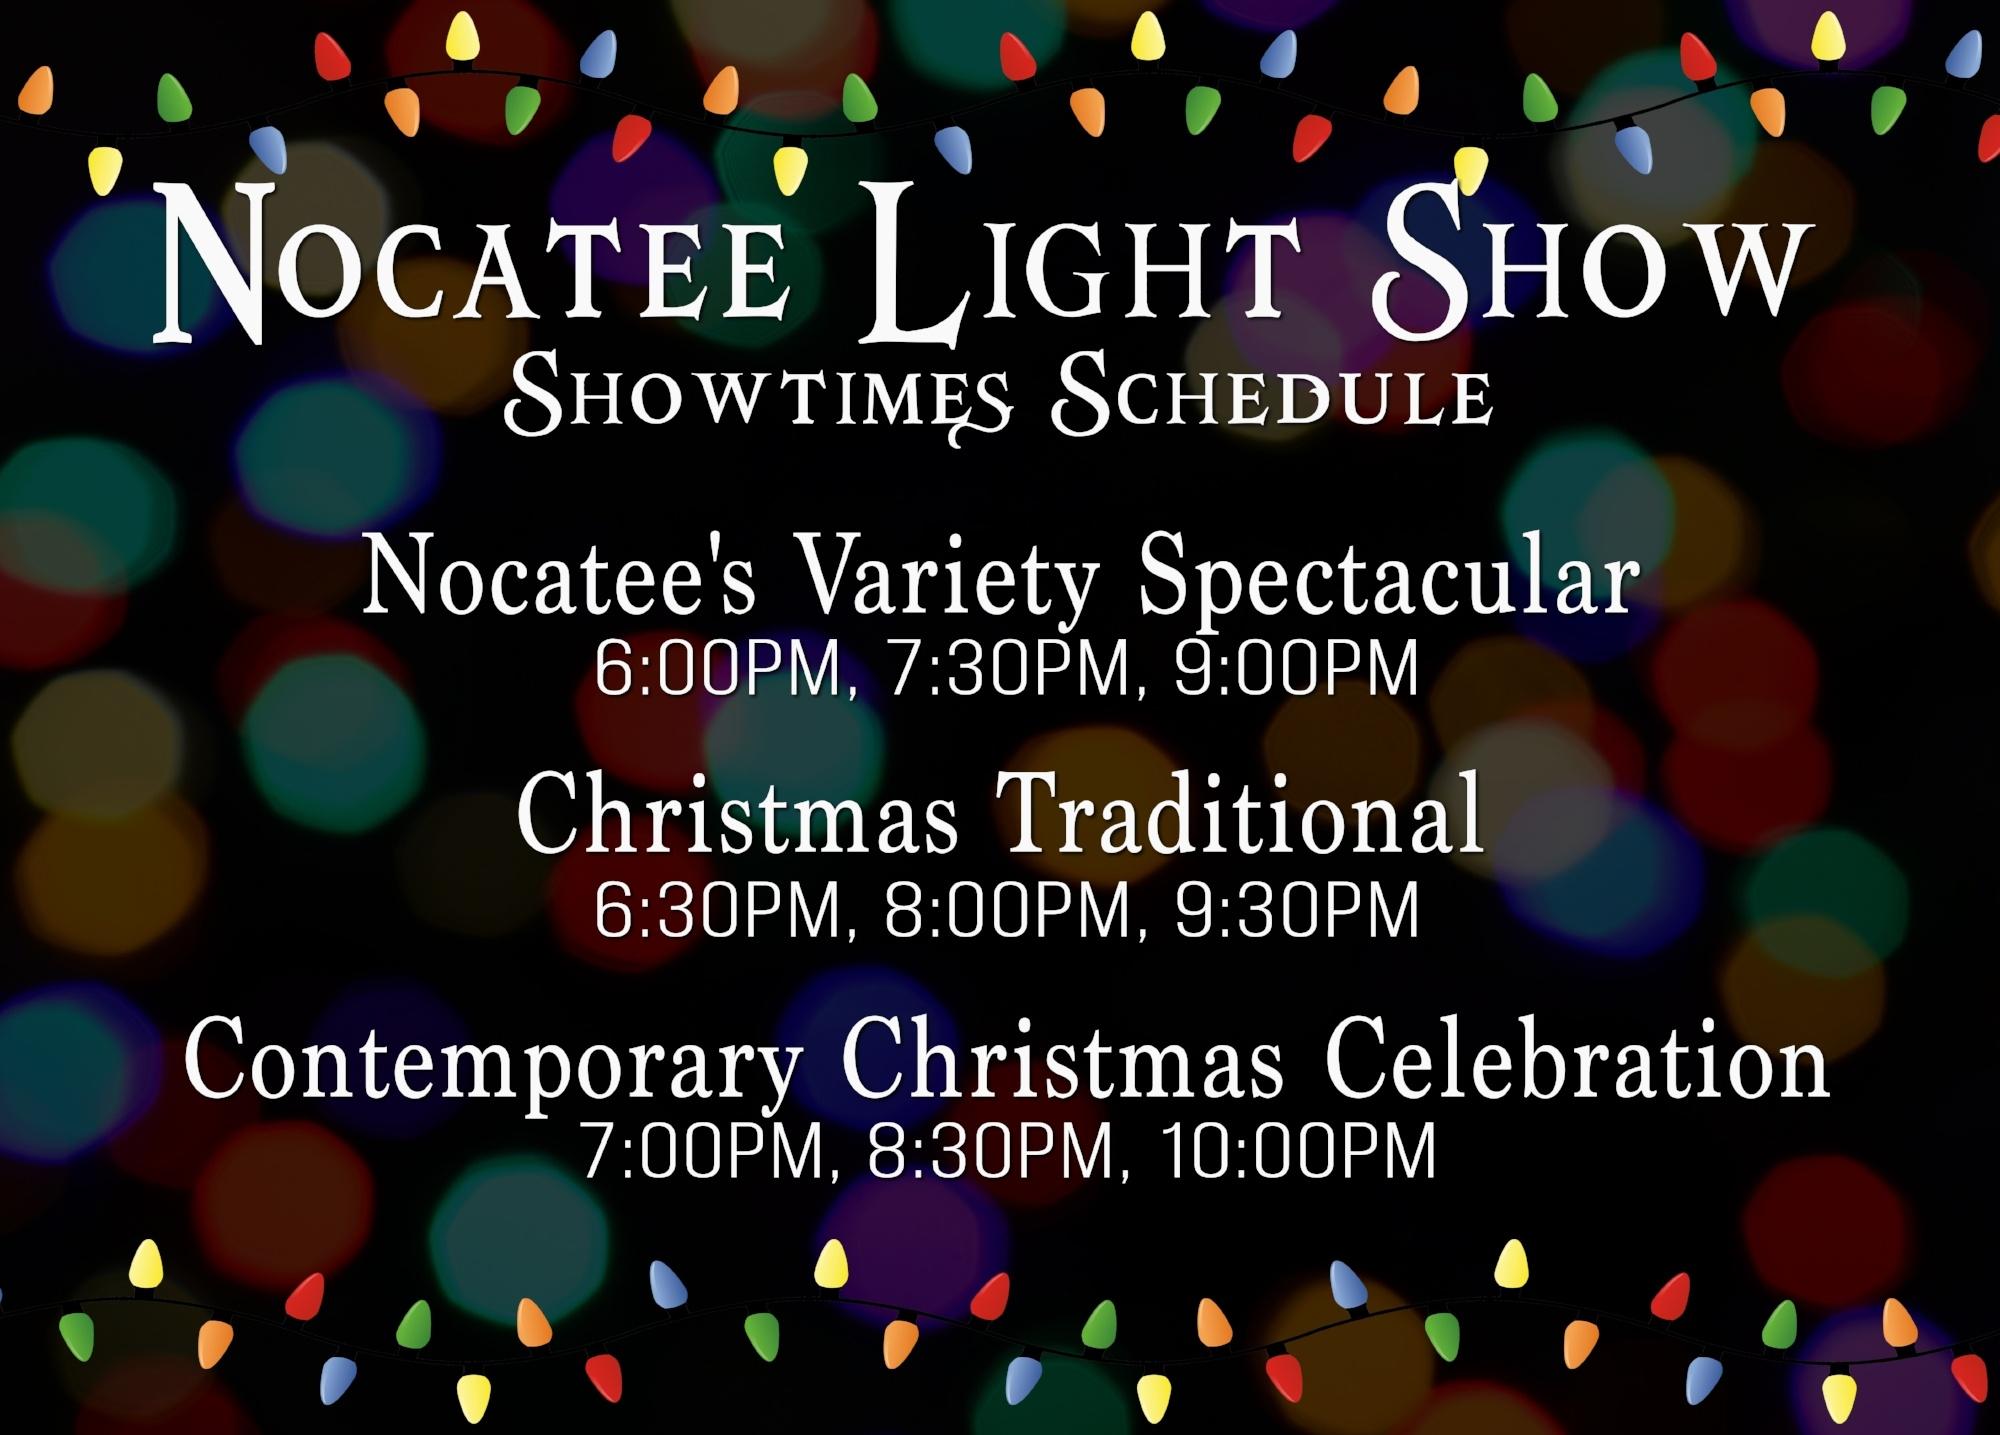 Nocatee Light Show 2017 at Splash Waterpark